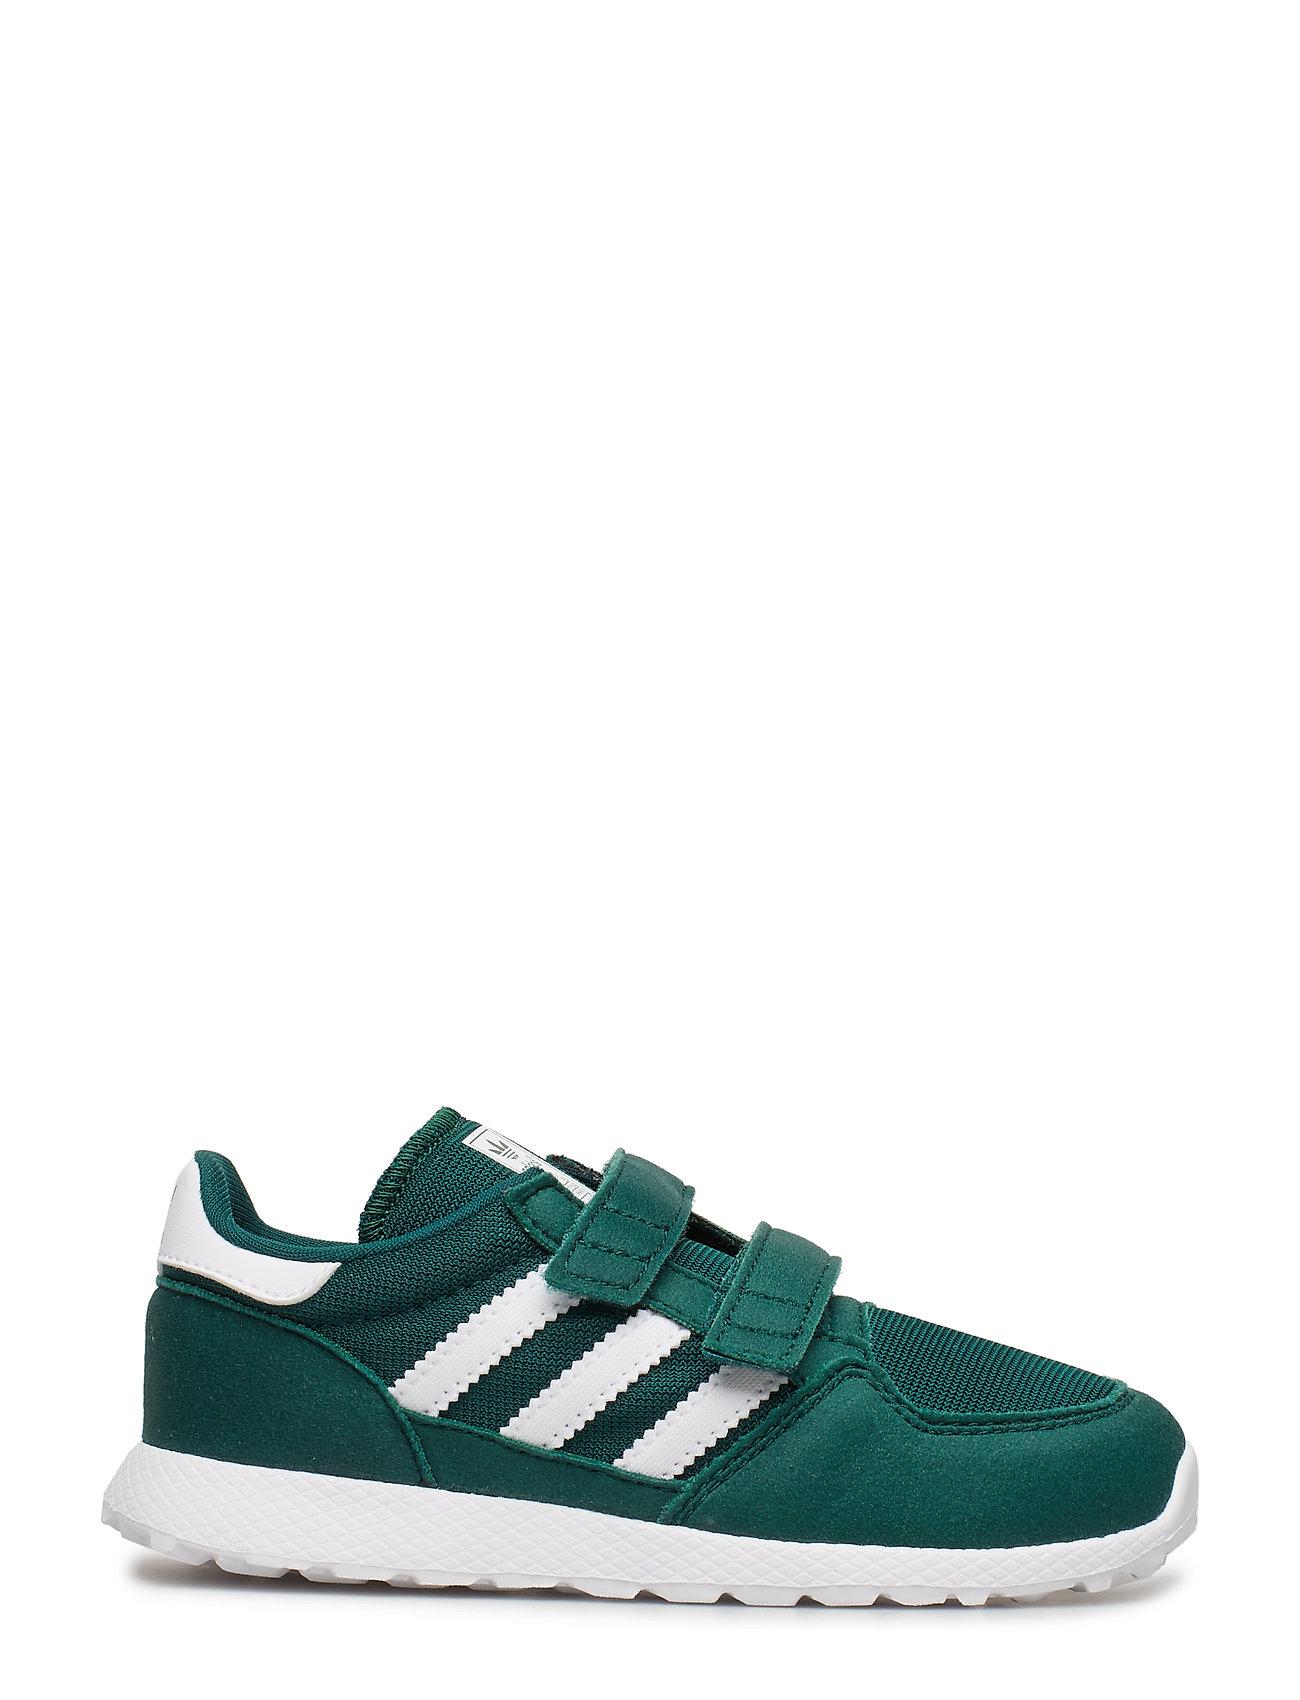 443f1161f1c CBLACK/CBLACK/CBLACK Adidas Forest Grove Cf I sneakers for børn ...